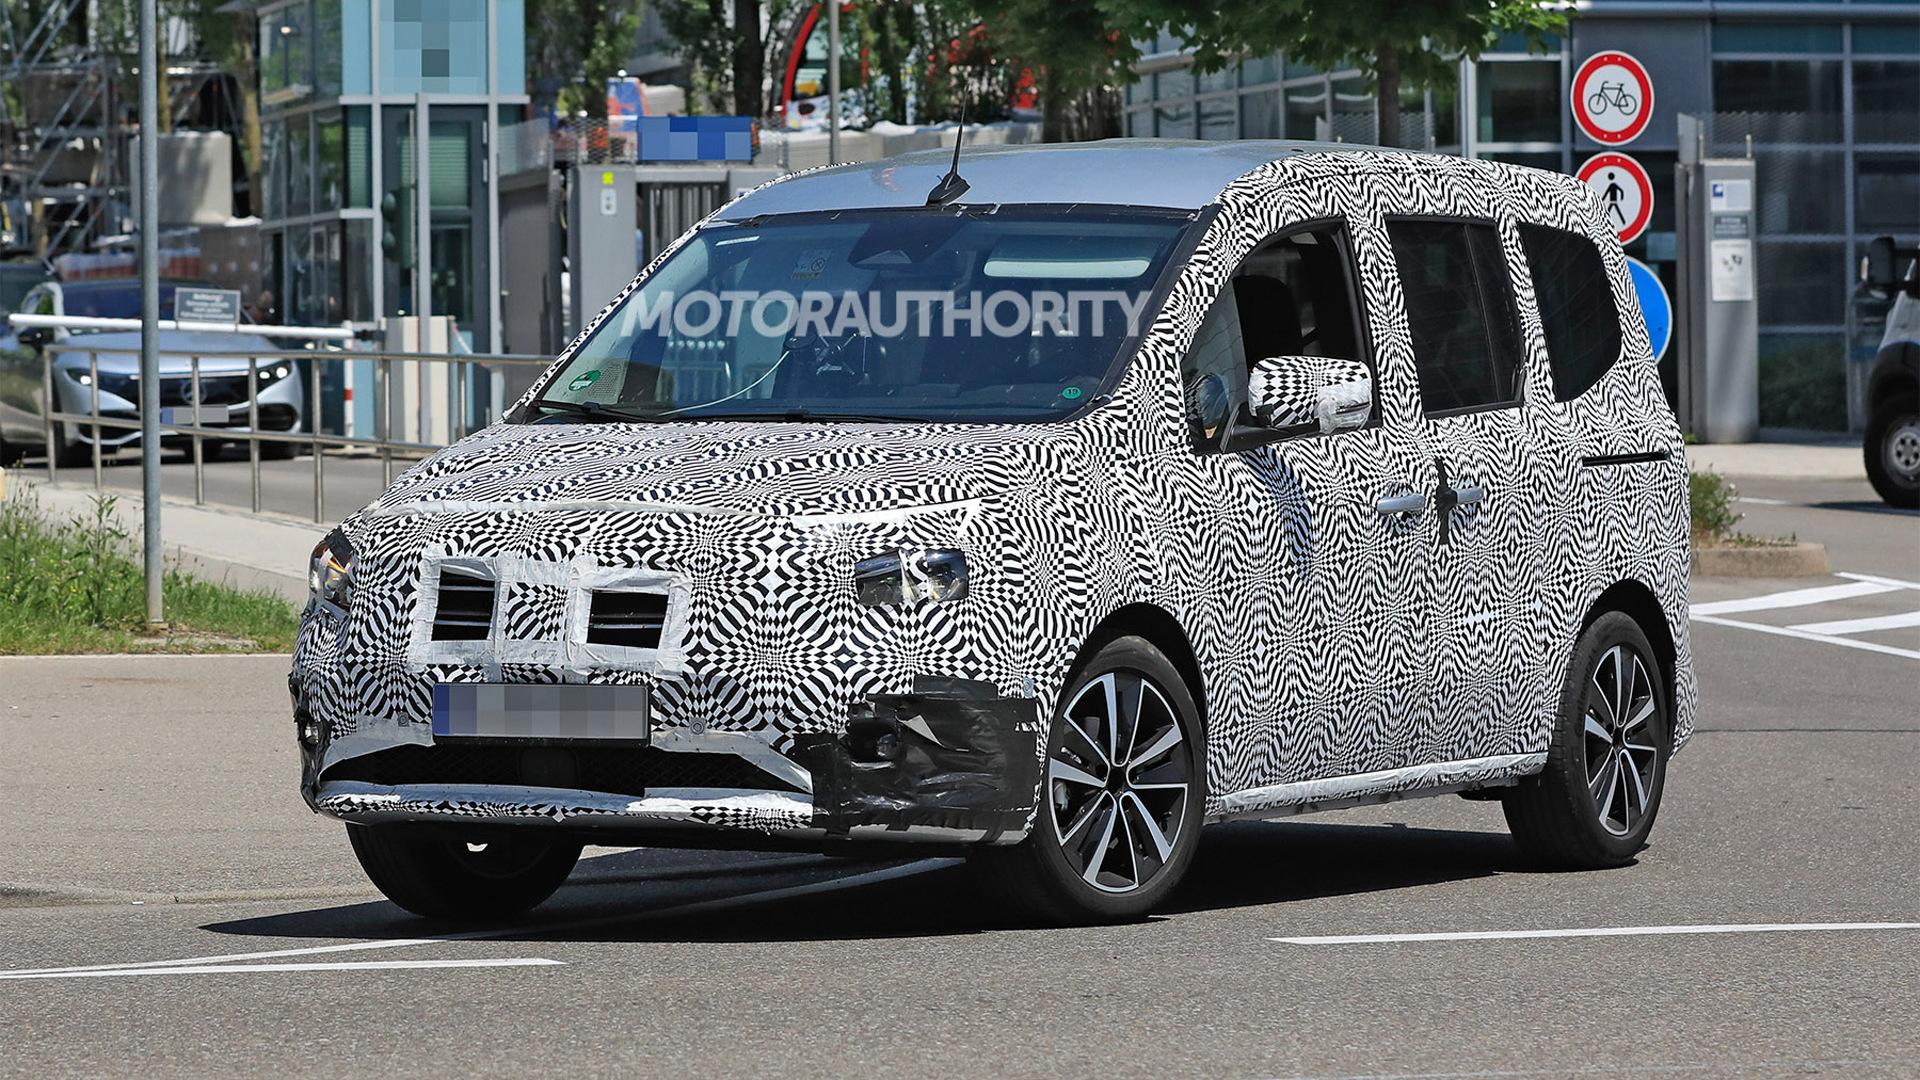 2022 Mercedes-Benz T-Class (Citan) spy shots - Photo credit: S. Baldauf/SB-Medien